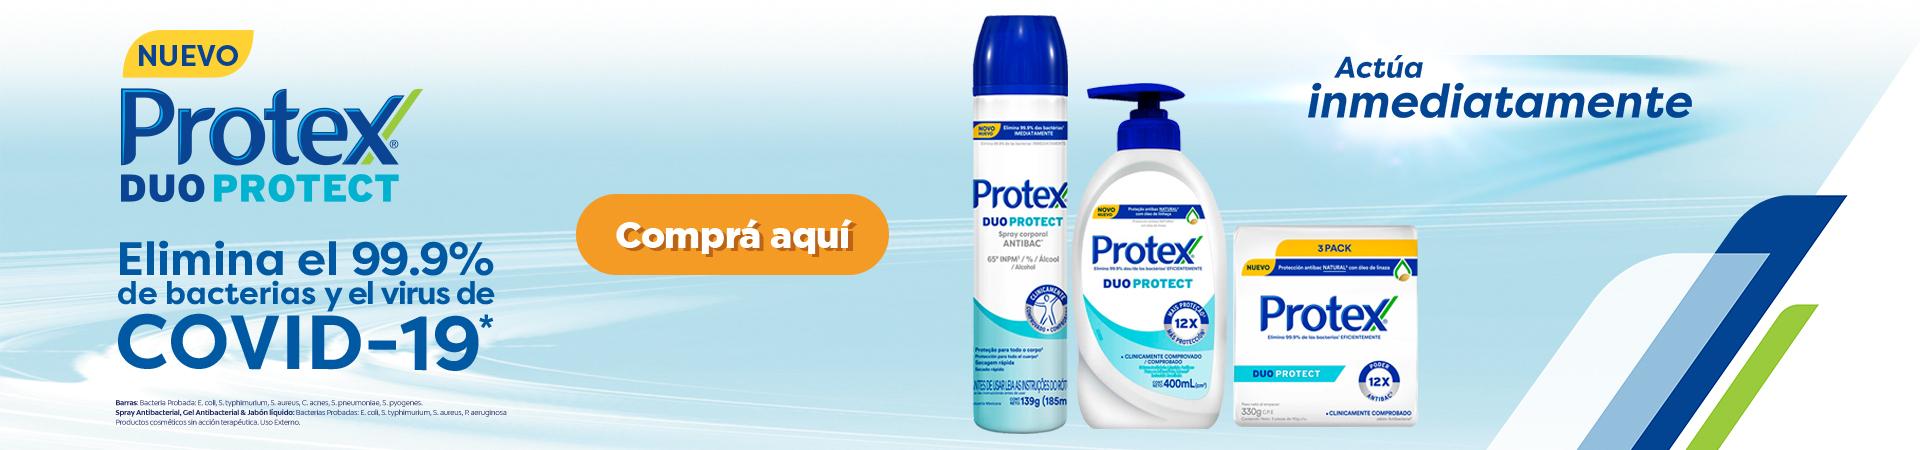 Duo Protex